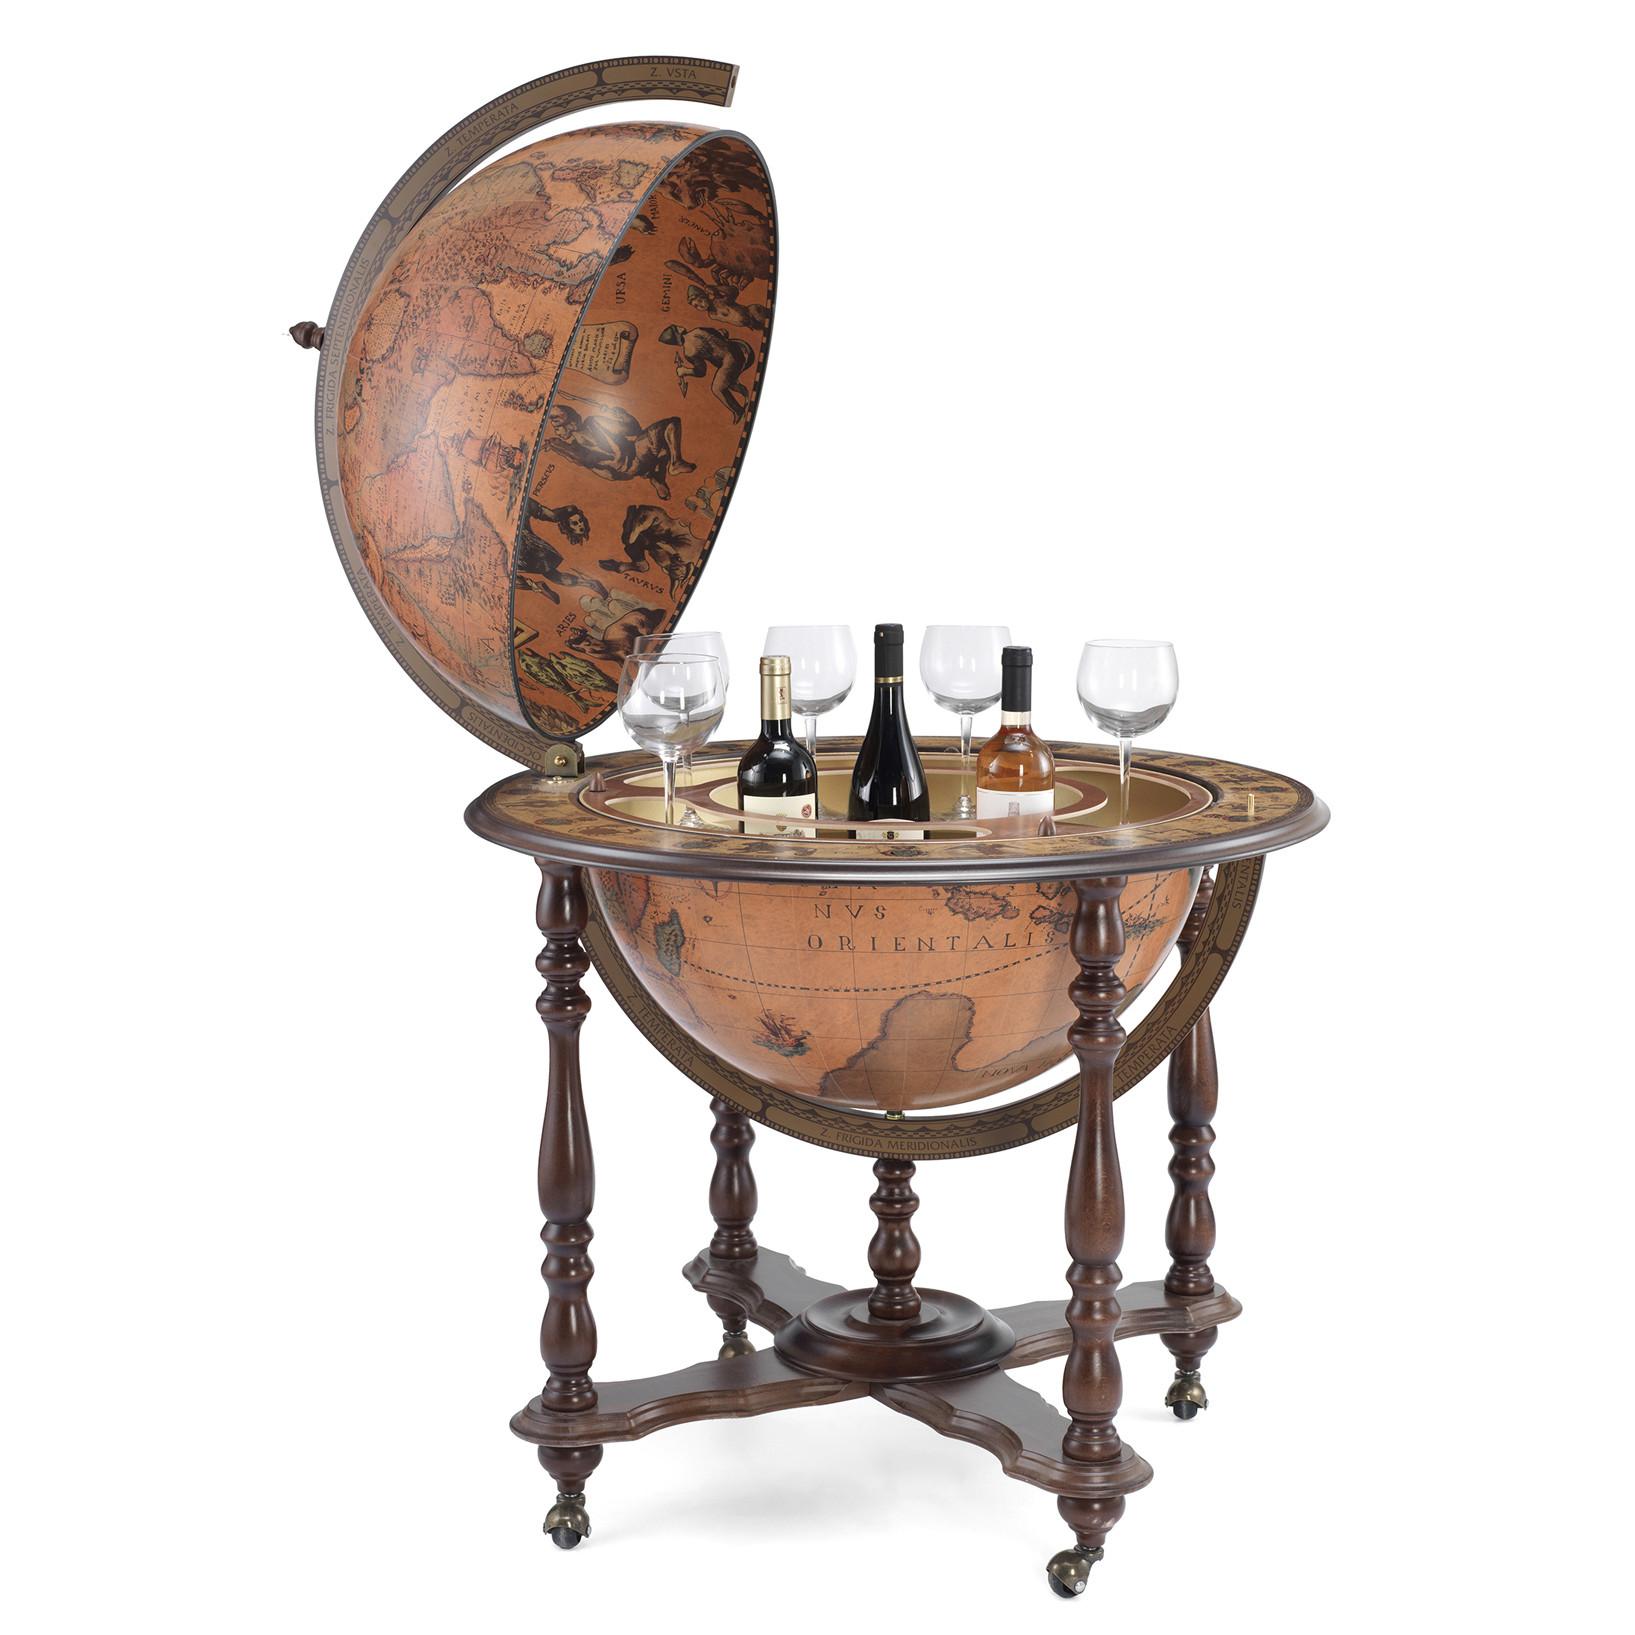 Bingham Globe Bar Made in Italy